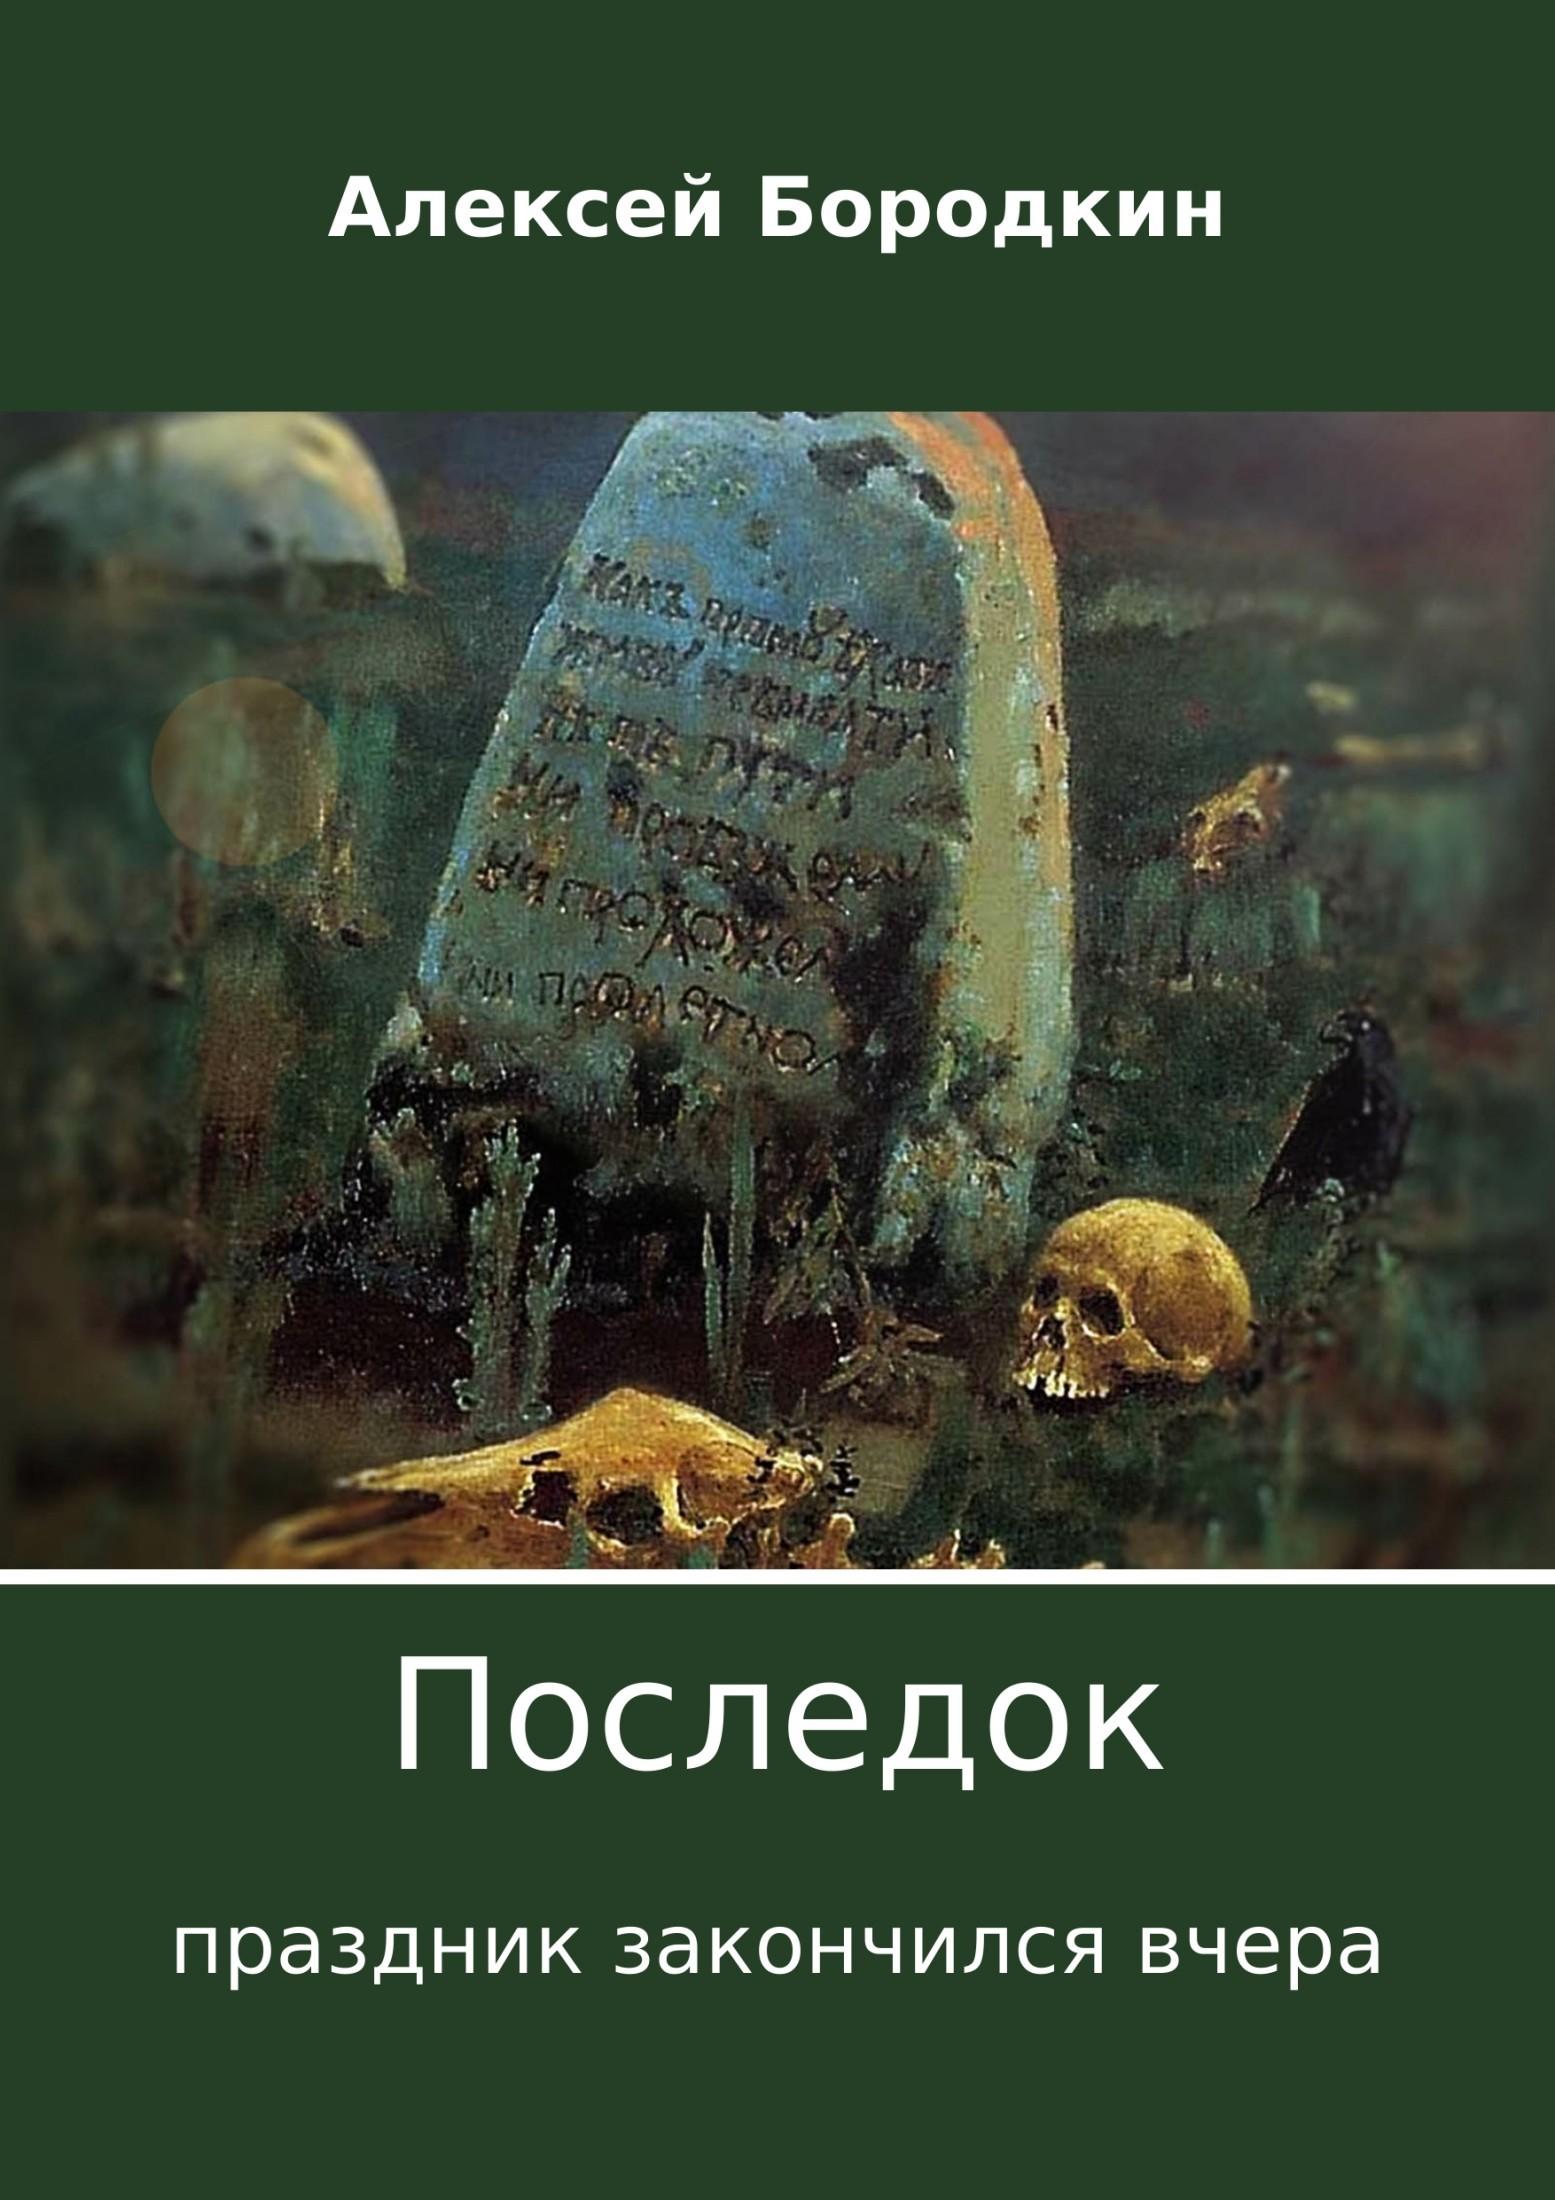 цена на Алексей Петрович Бородкин Последок. Праздник закончился вчера